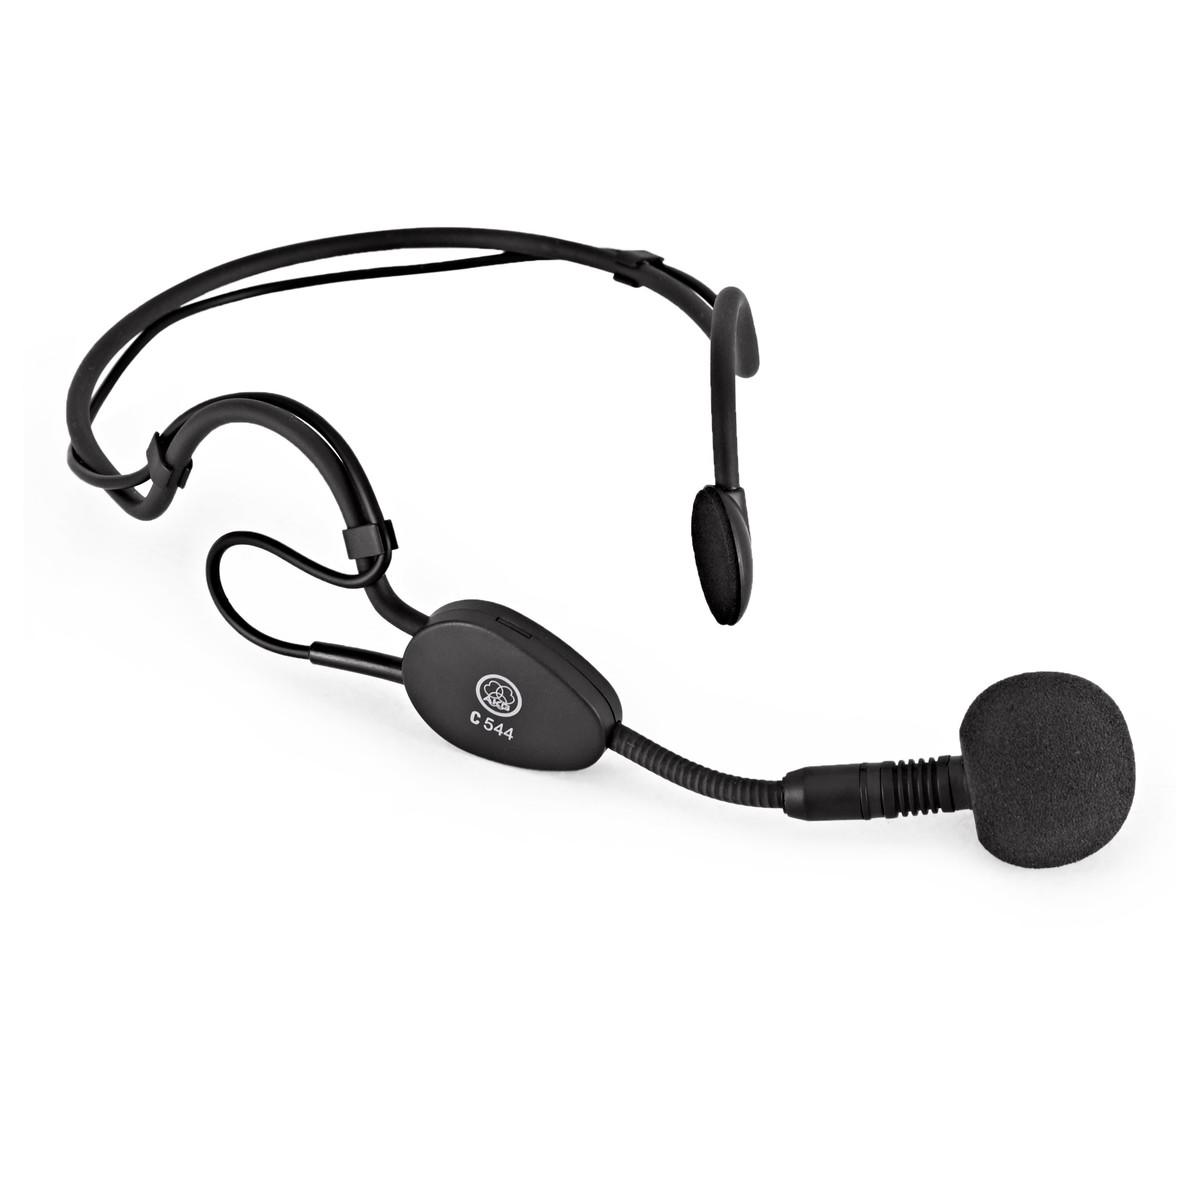 Awe Inspiring Akg C544 L Headworn Condenser Microphone Gear4Music Wiring 101 Capemaxxcnl